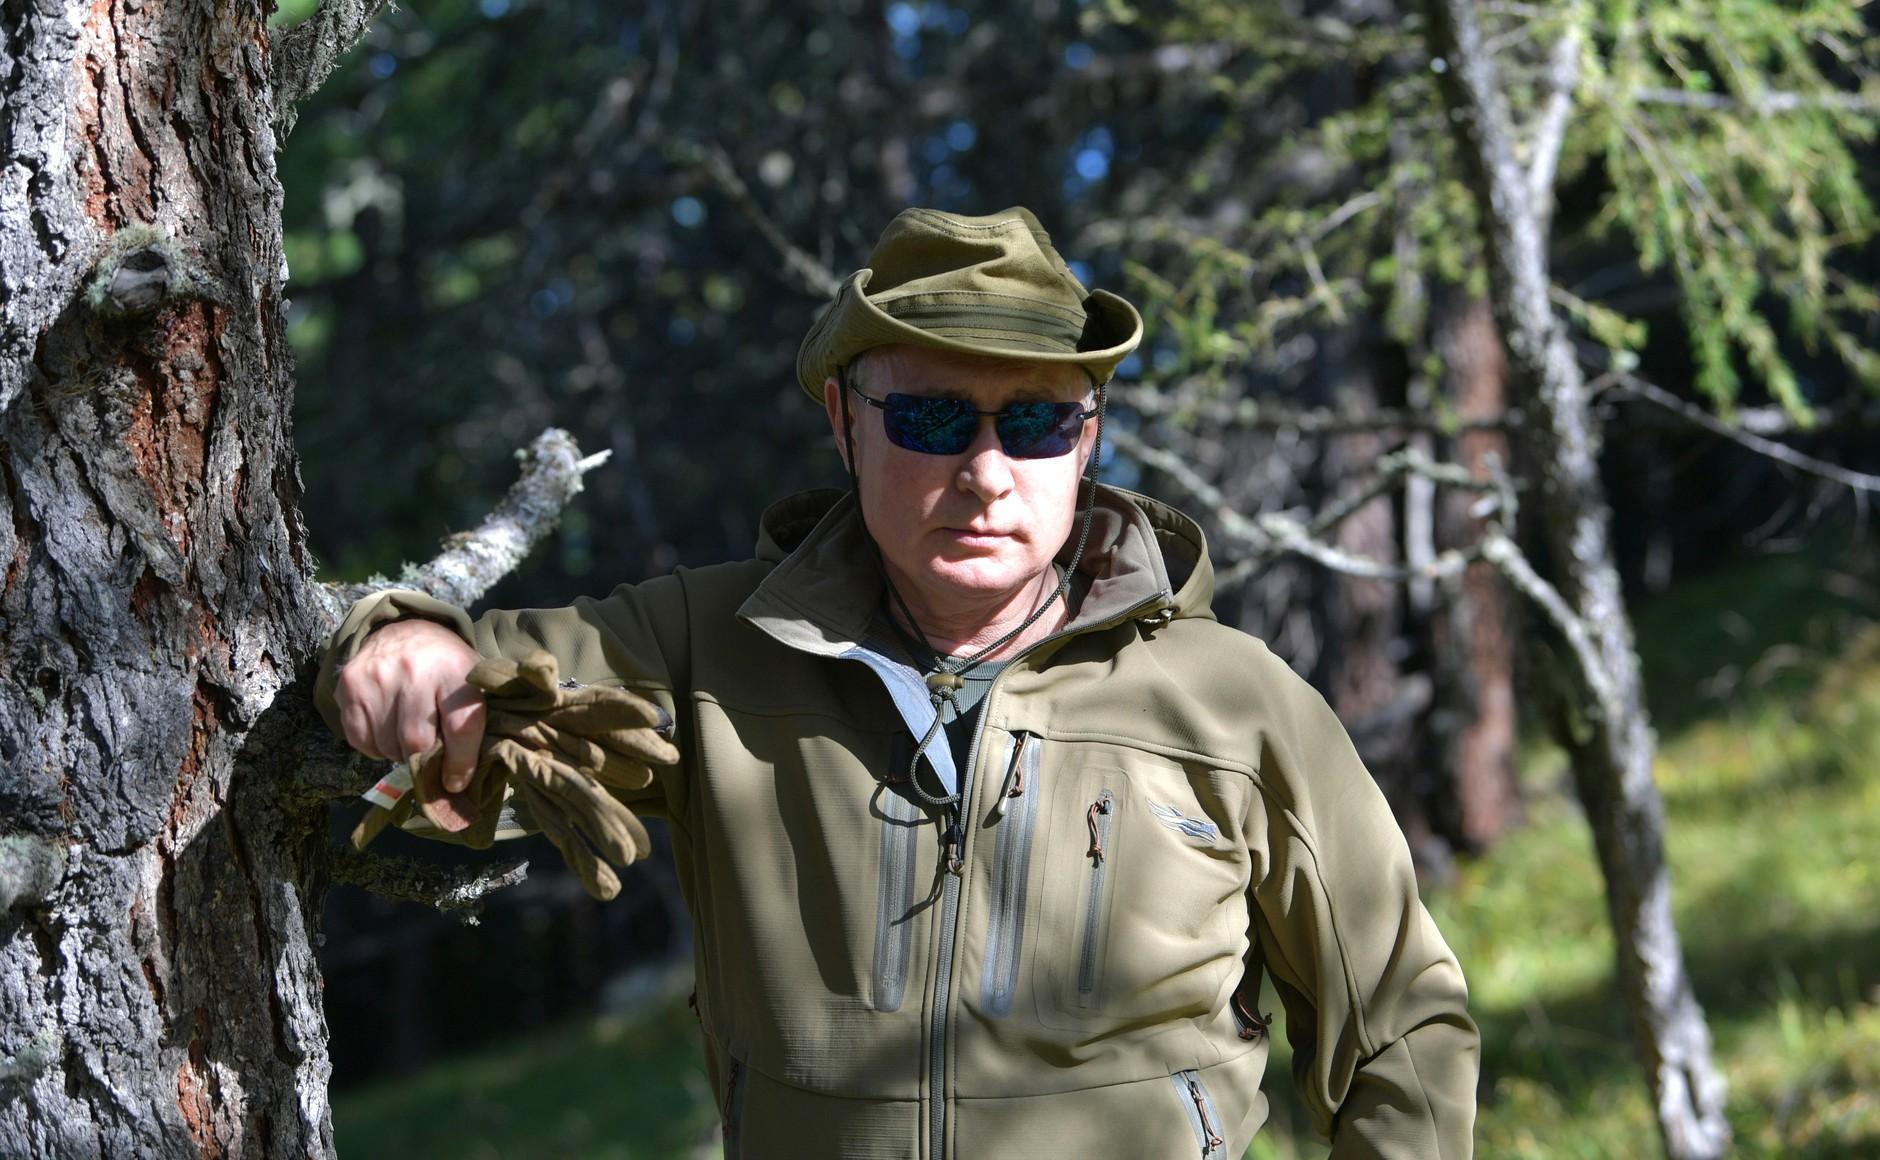 "<p>Фото ©<a href=""http://kremlin.ru/events/president/news/61732/photos"" target=""_self""> Kremlin.ru </a></p>"